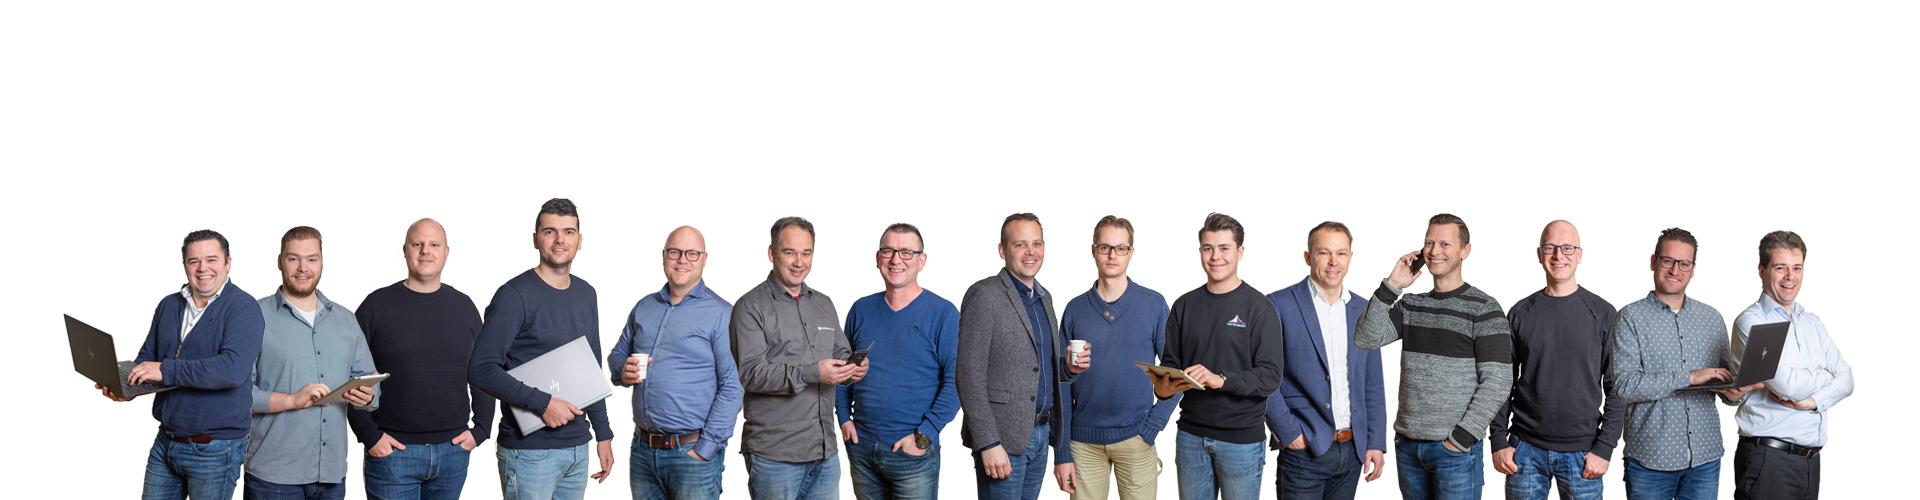 Teamfoto ICT